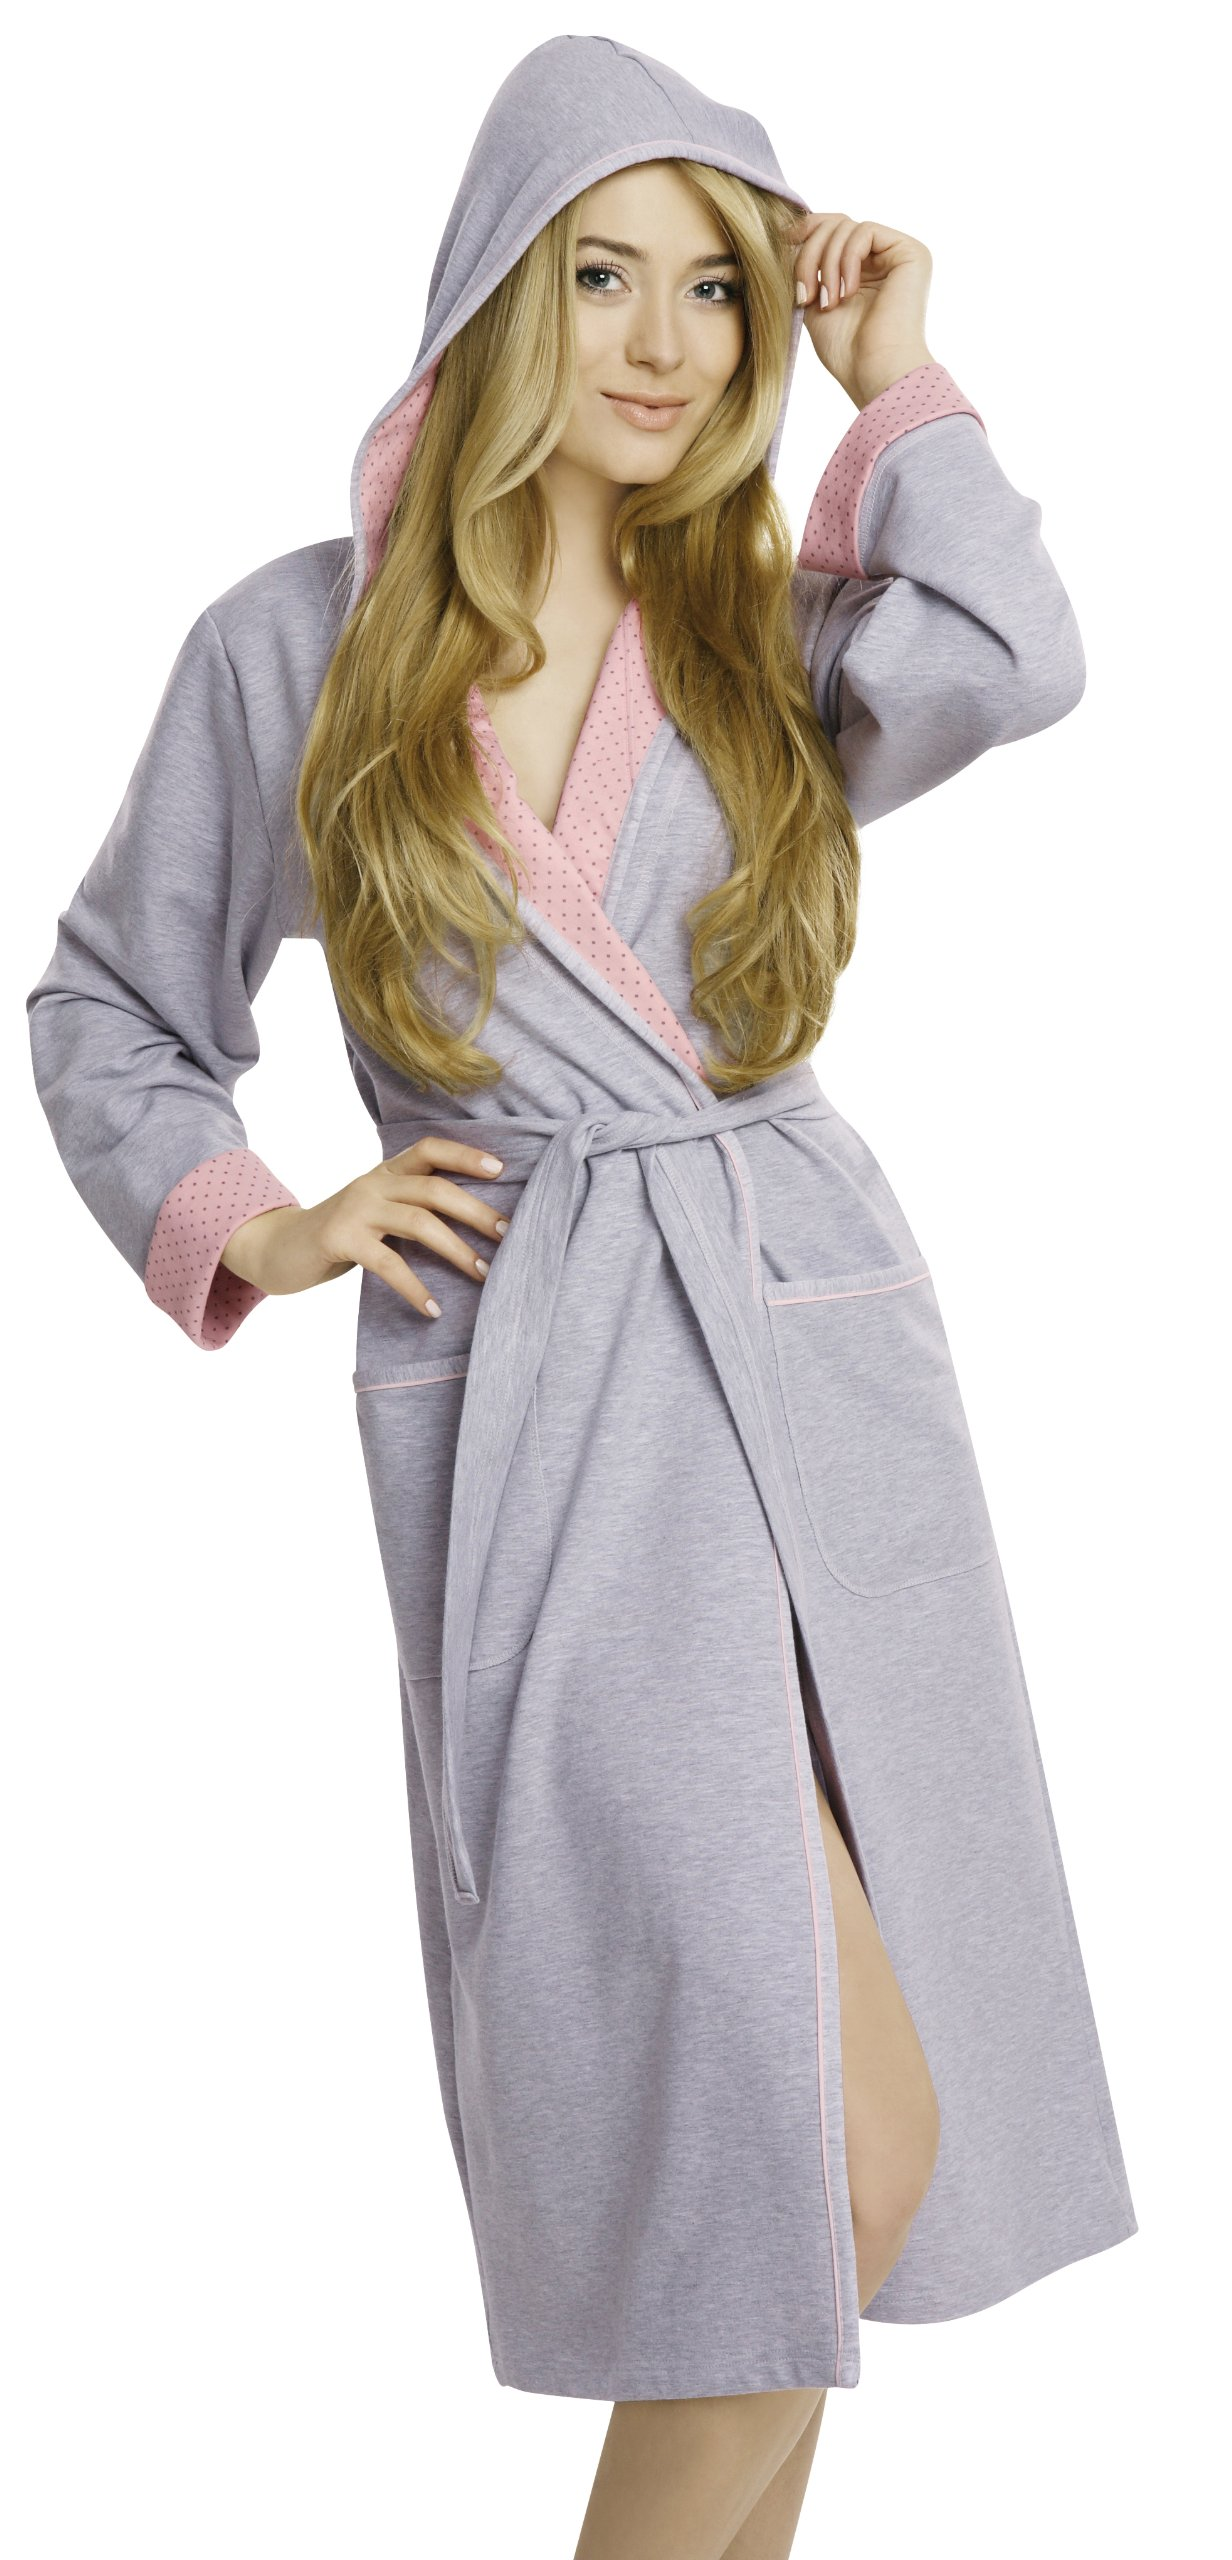 Italian Fashion IF Bata con Capucha Vestido de Casa Mujer Komfort product image